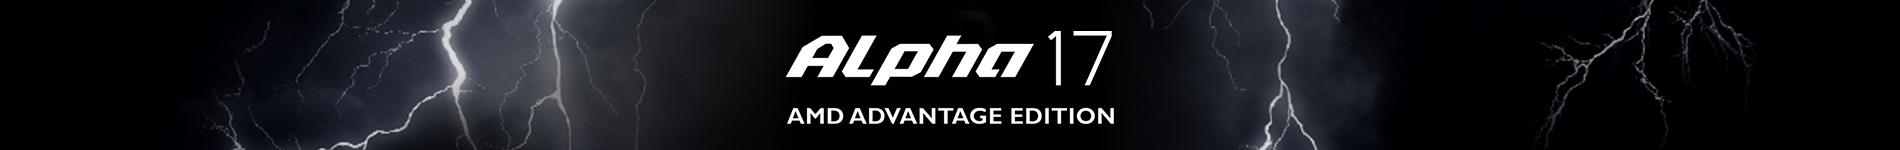 Msi Alpha17 AMDadvantage 09.13.bnr